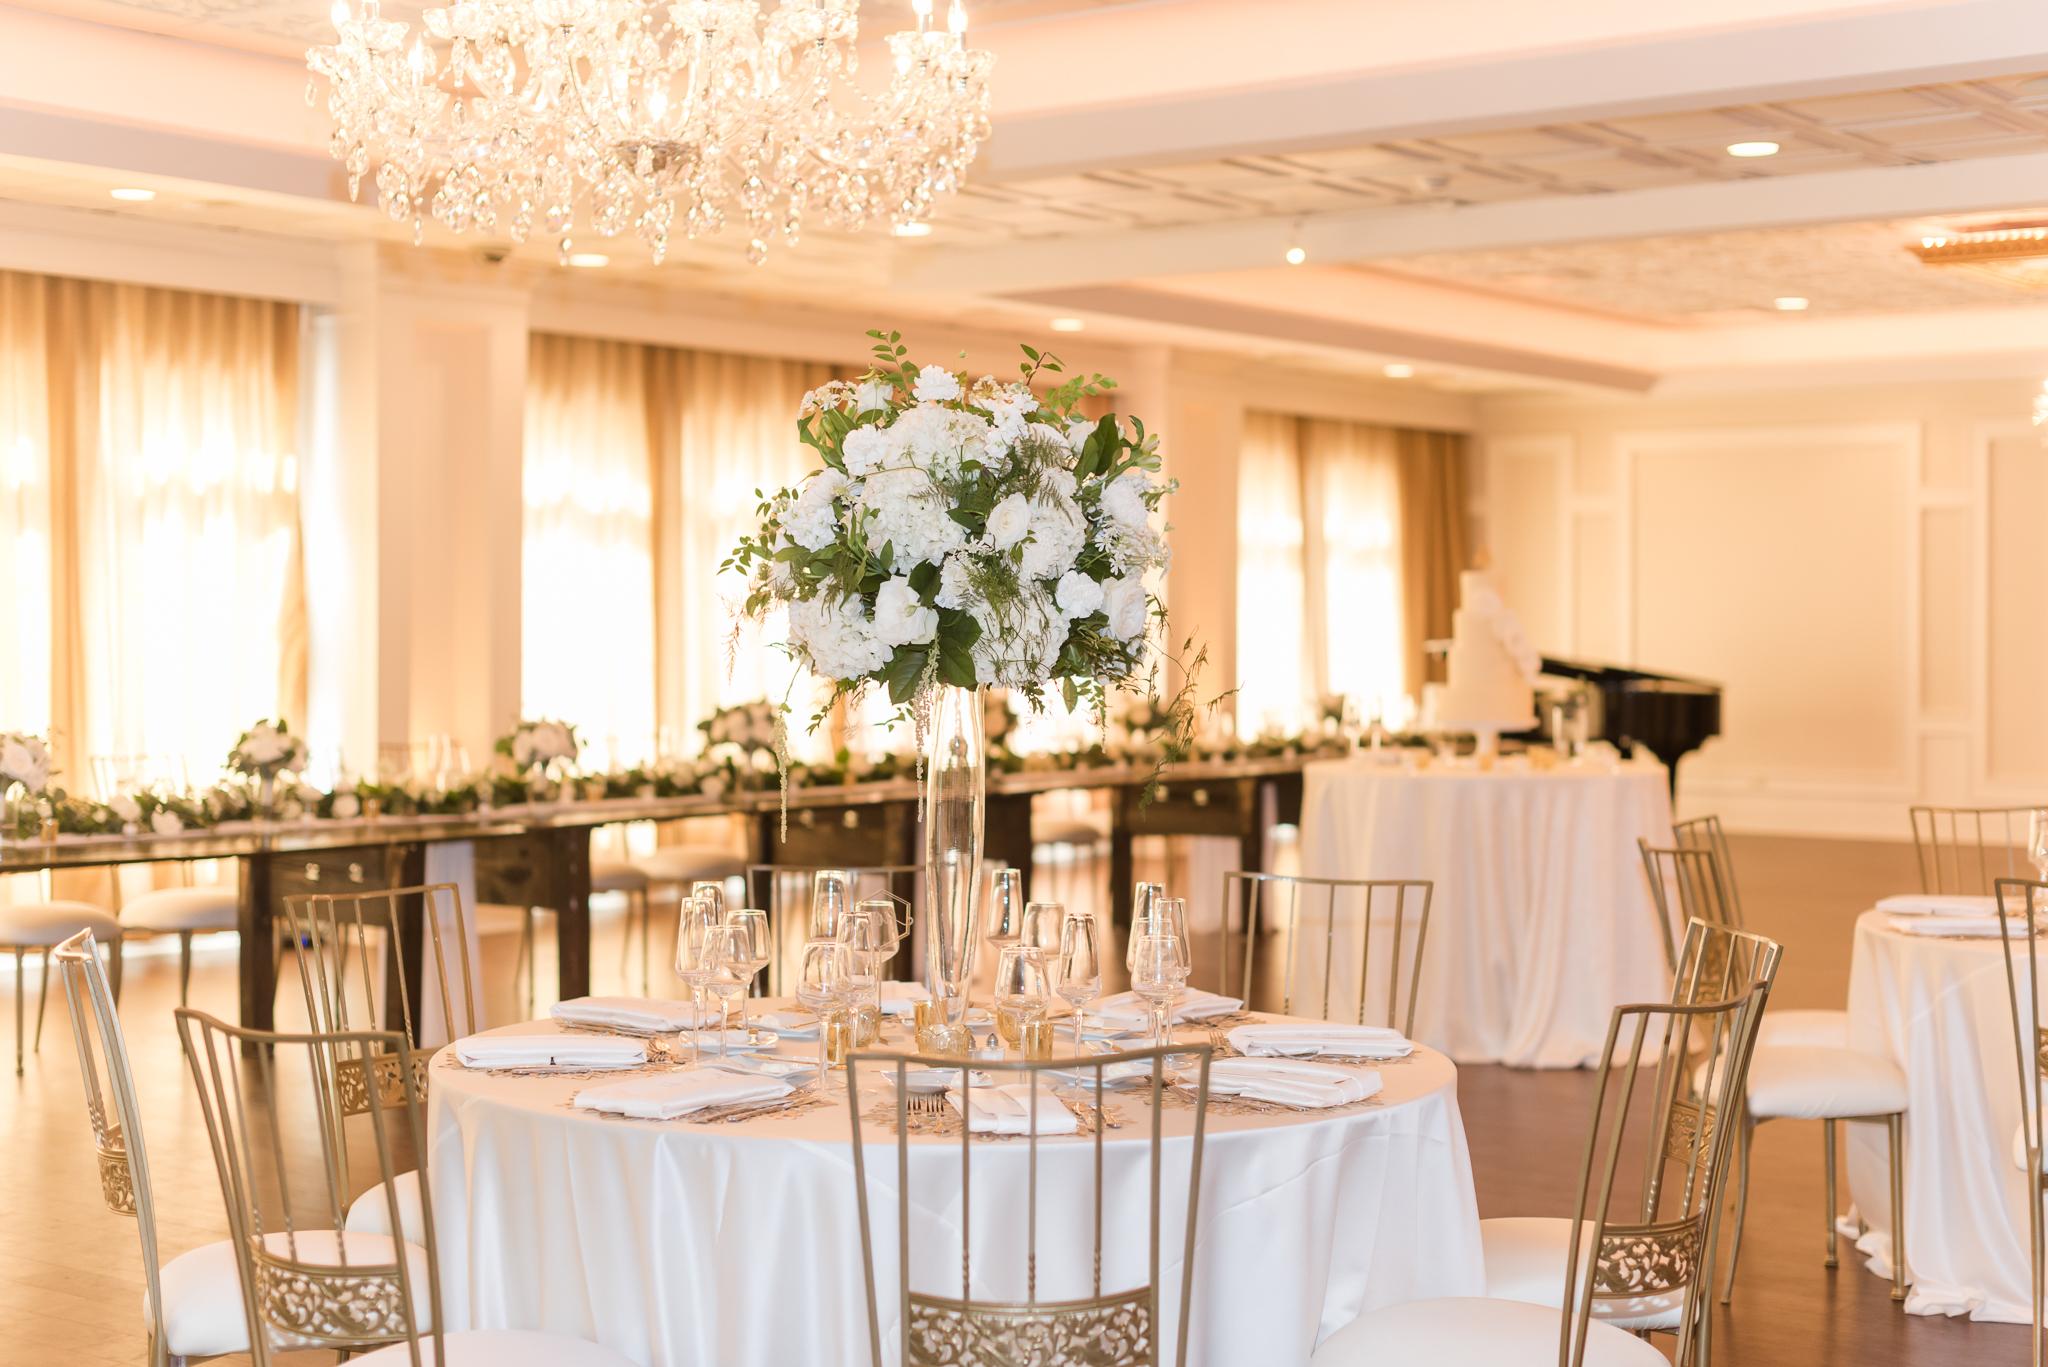 Black Iris Estate Wedding Elegant White with Greenery Luxury High End Flowers-17.jpg